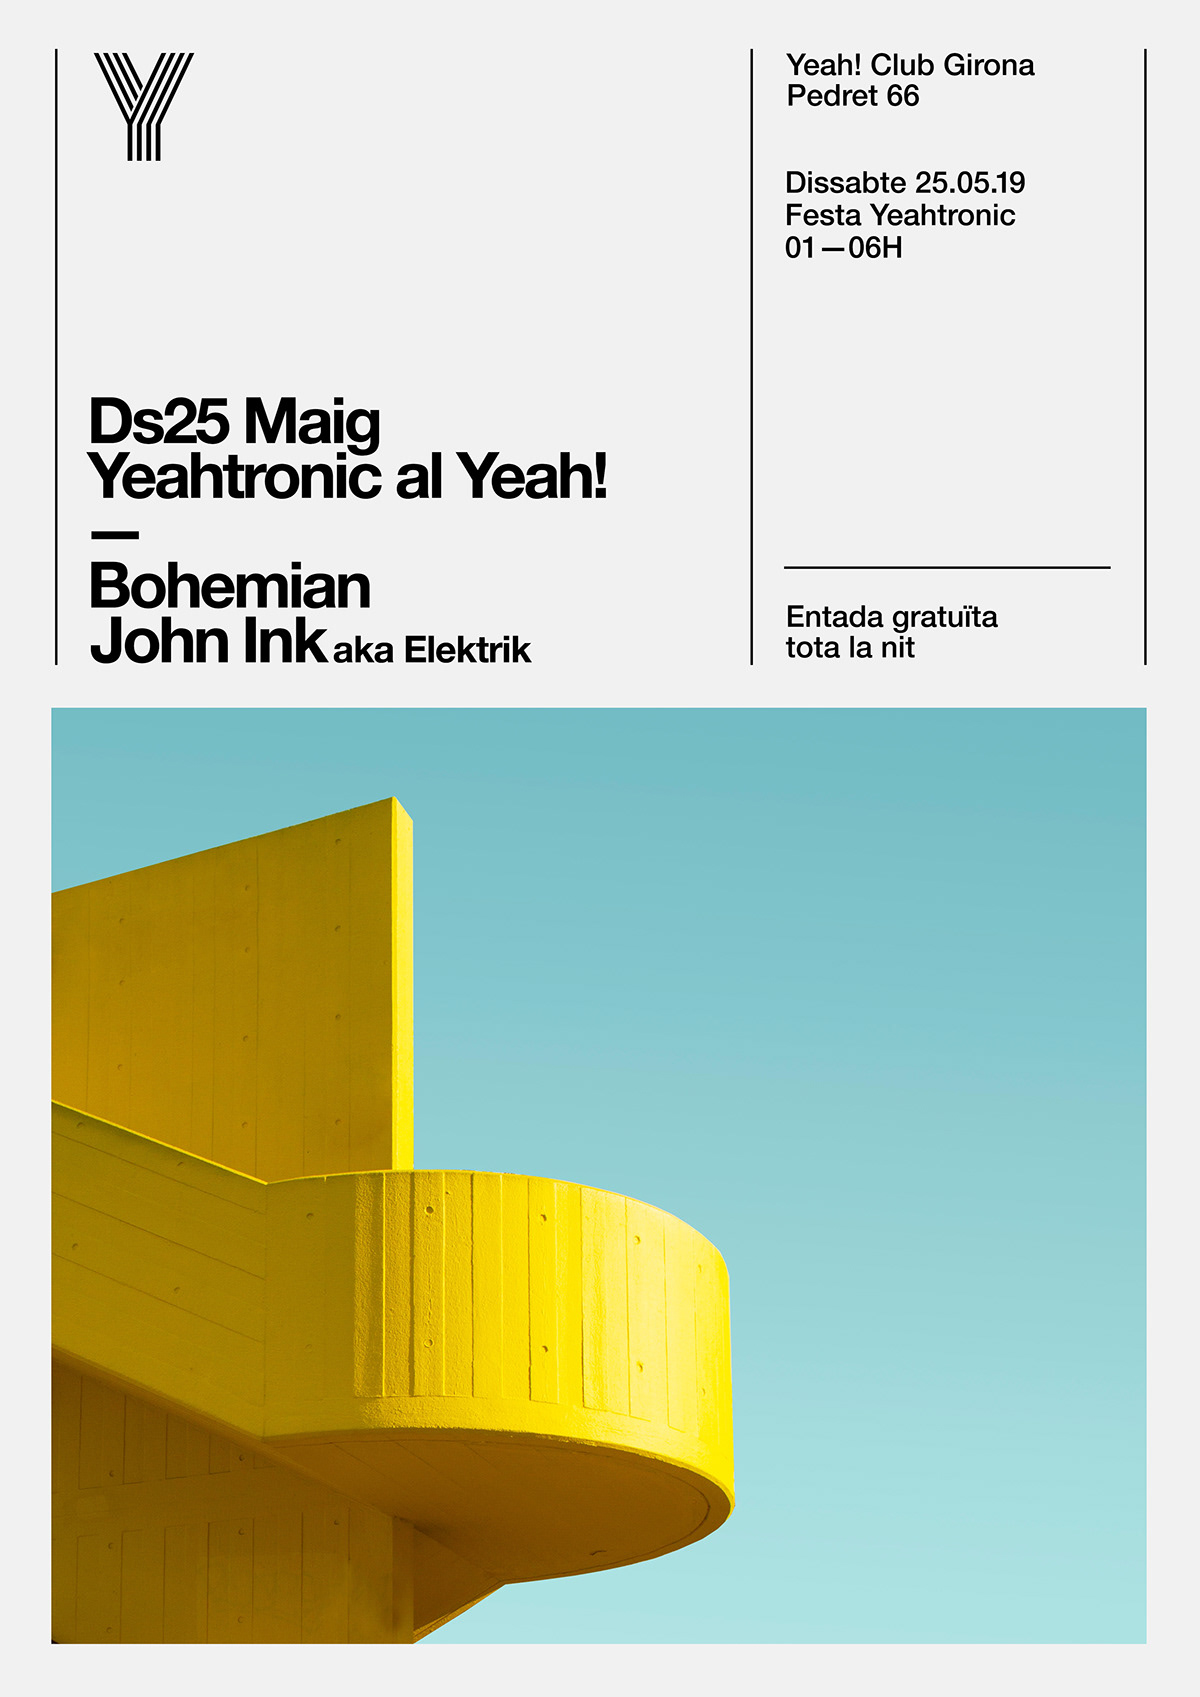 posters designer trends Collection INFLUENCER graphic design  Art Director colour inspiration tencences